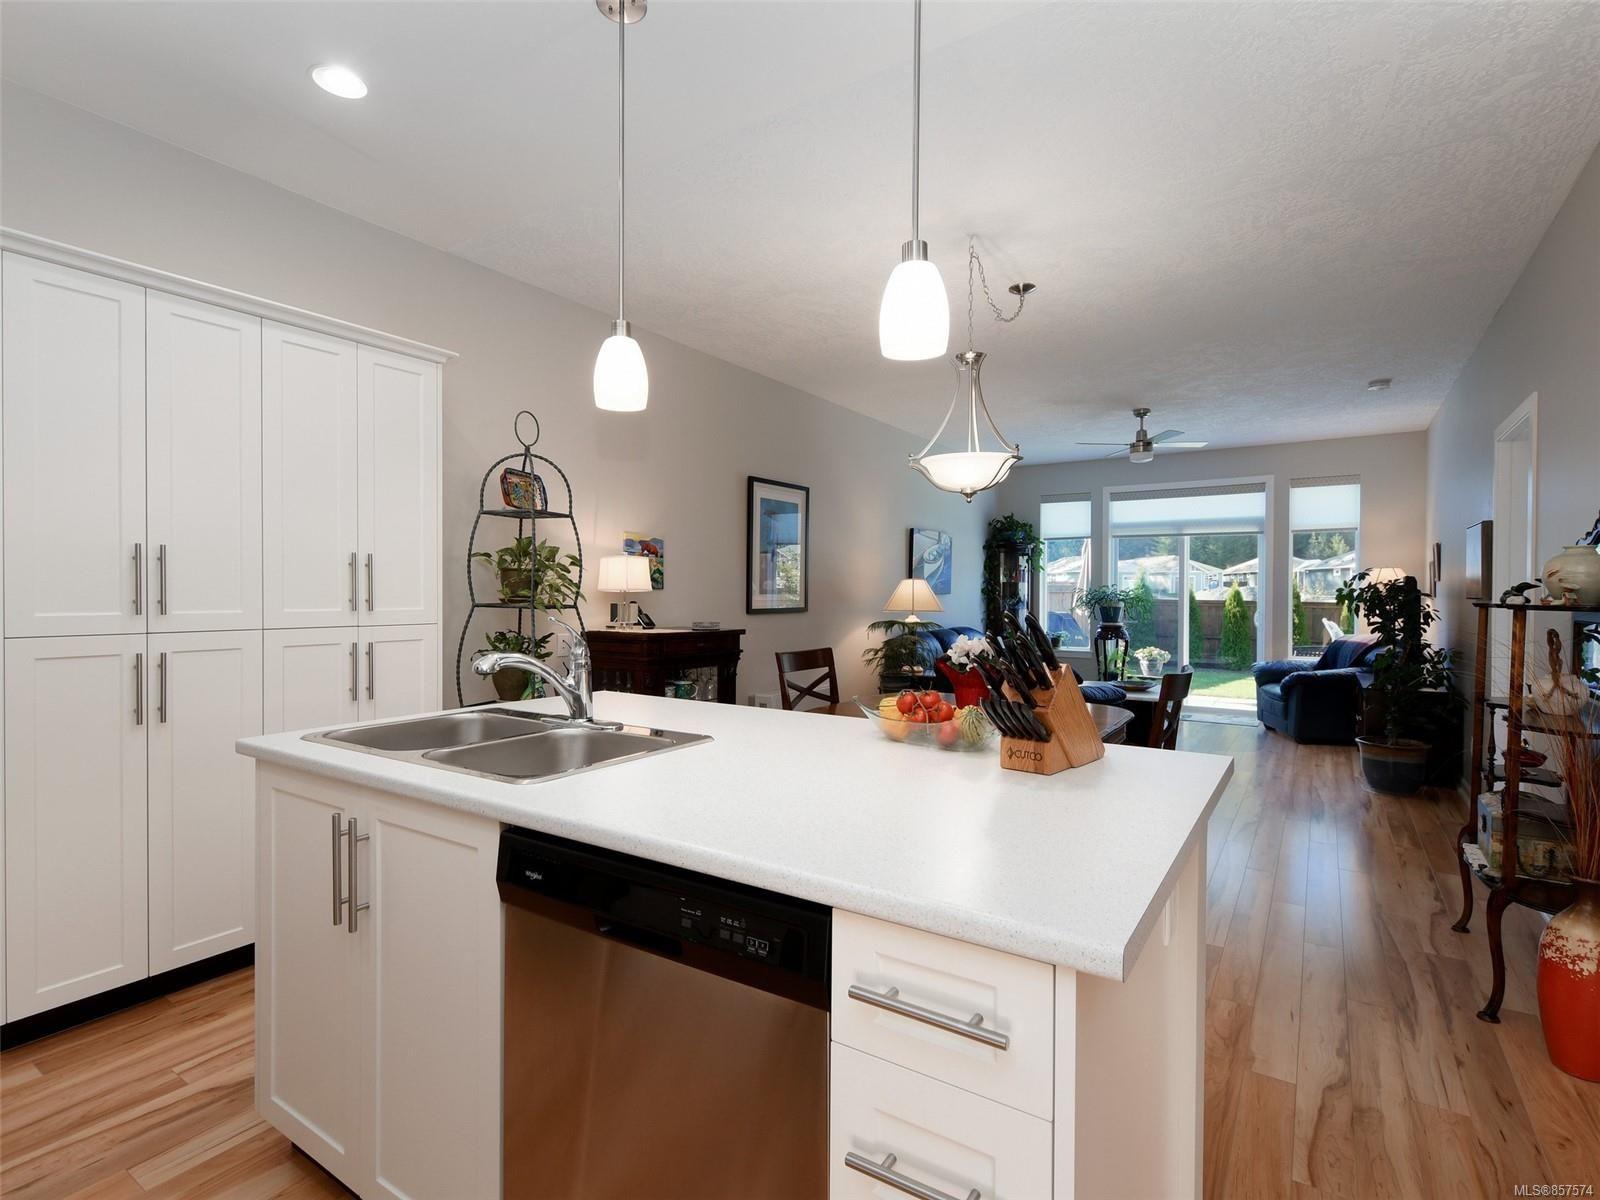 Photo 9: Photos: 6376 Shambrook Dr in : Sk Sunriver House for sale (Sooke)  : MLS®# 857574